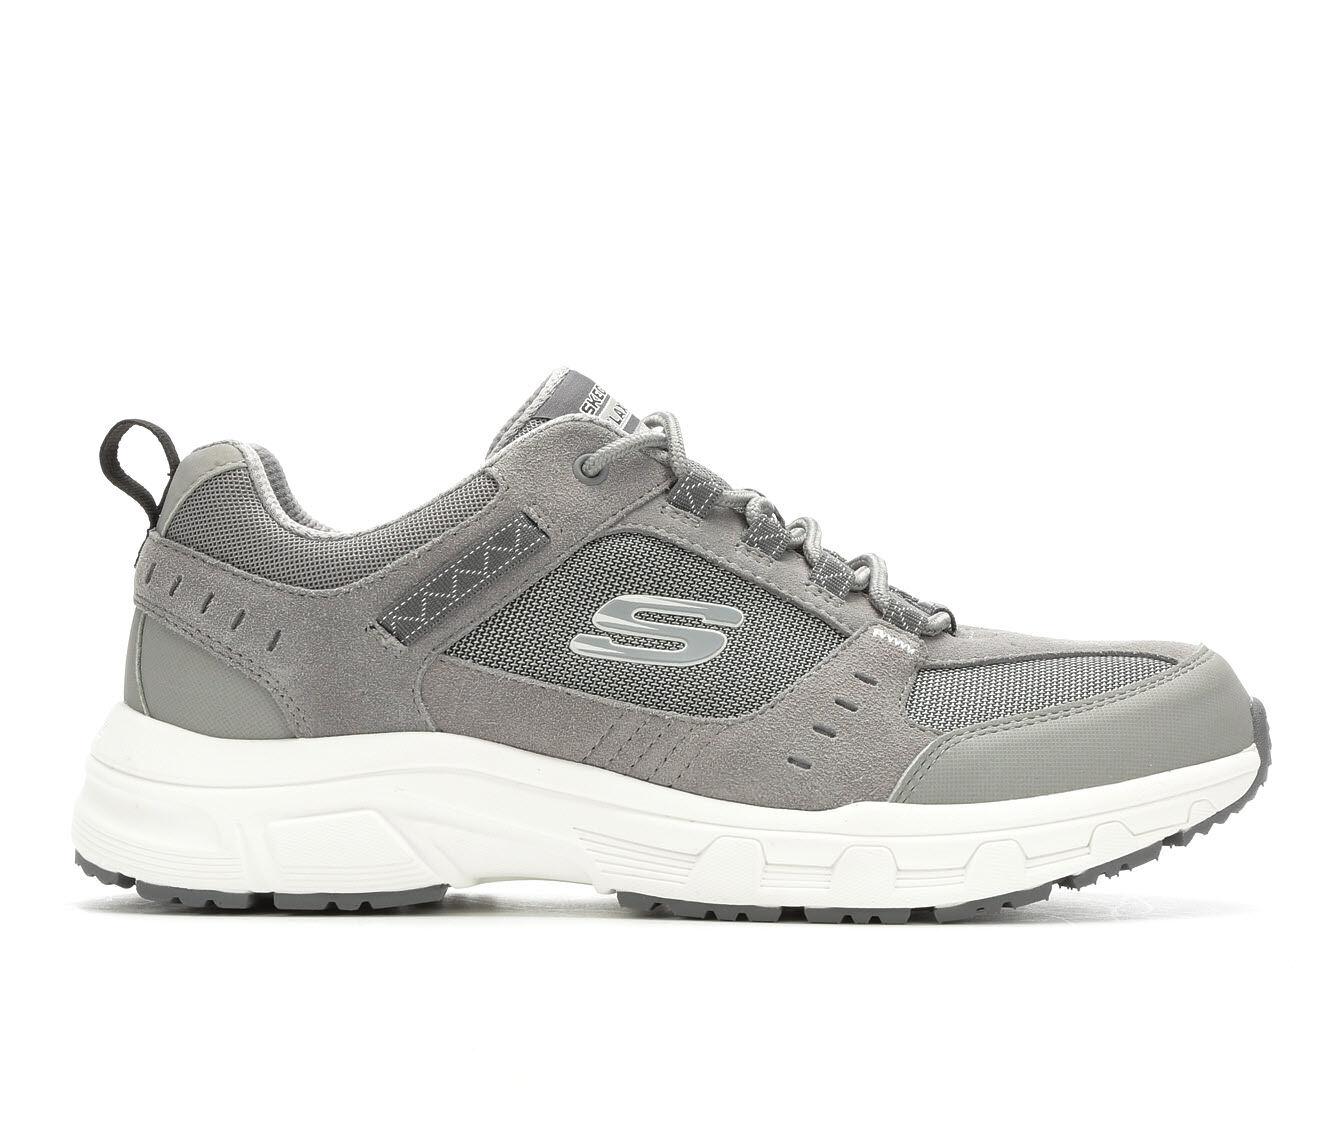 Skechers Mens Oak Canyon Walking Shoes Relaxed Fit Memory